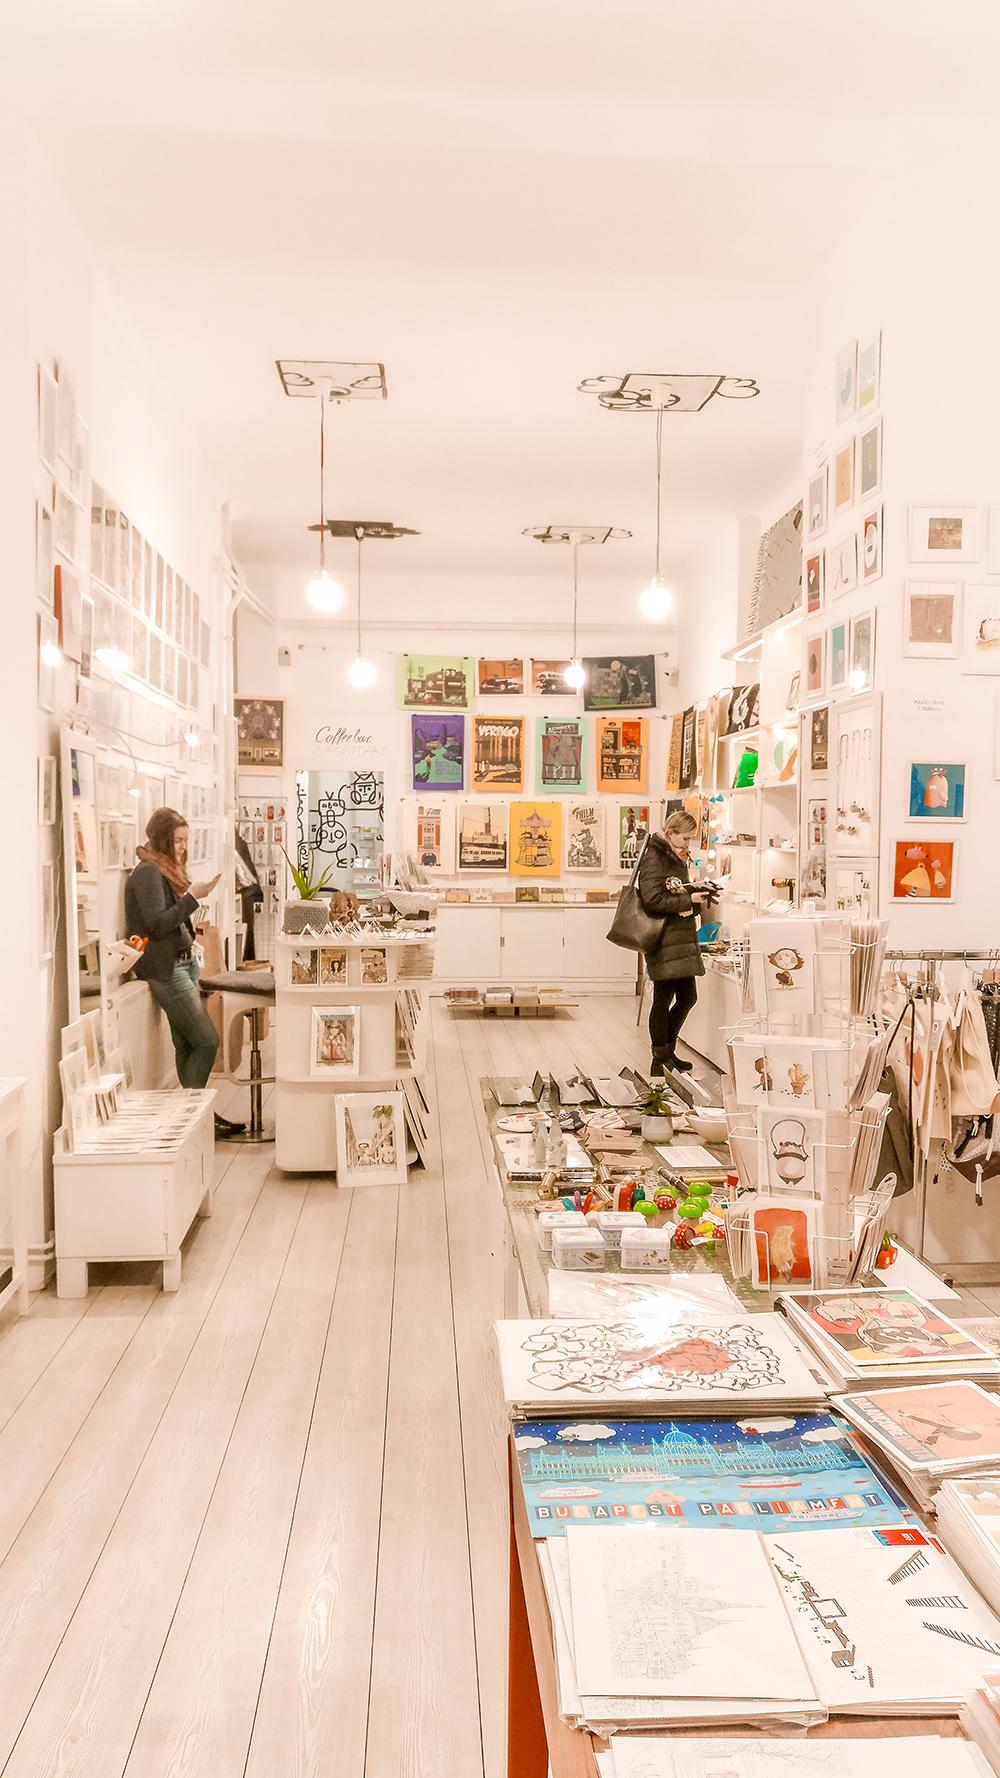 Rododendron Art & Design Shop - Budapest design shop guide to best Hungarian souvenirs | Aliz's Wonderland